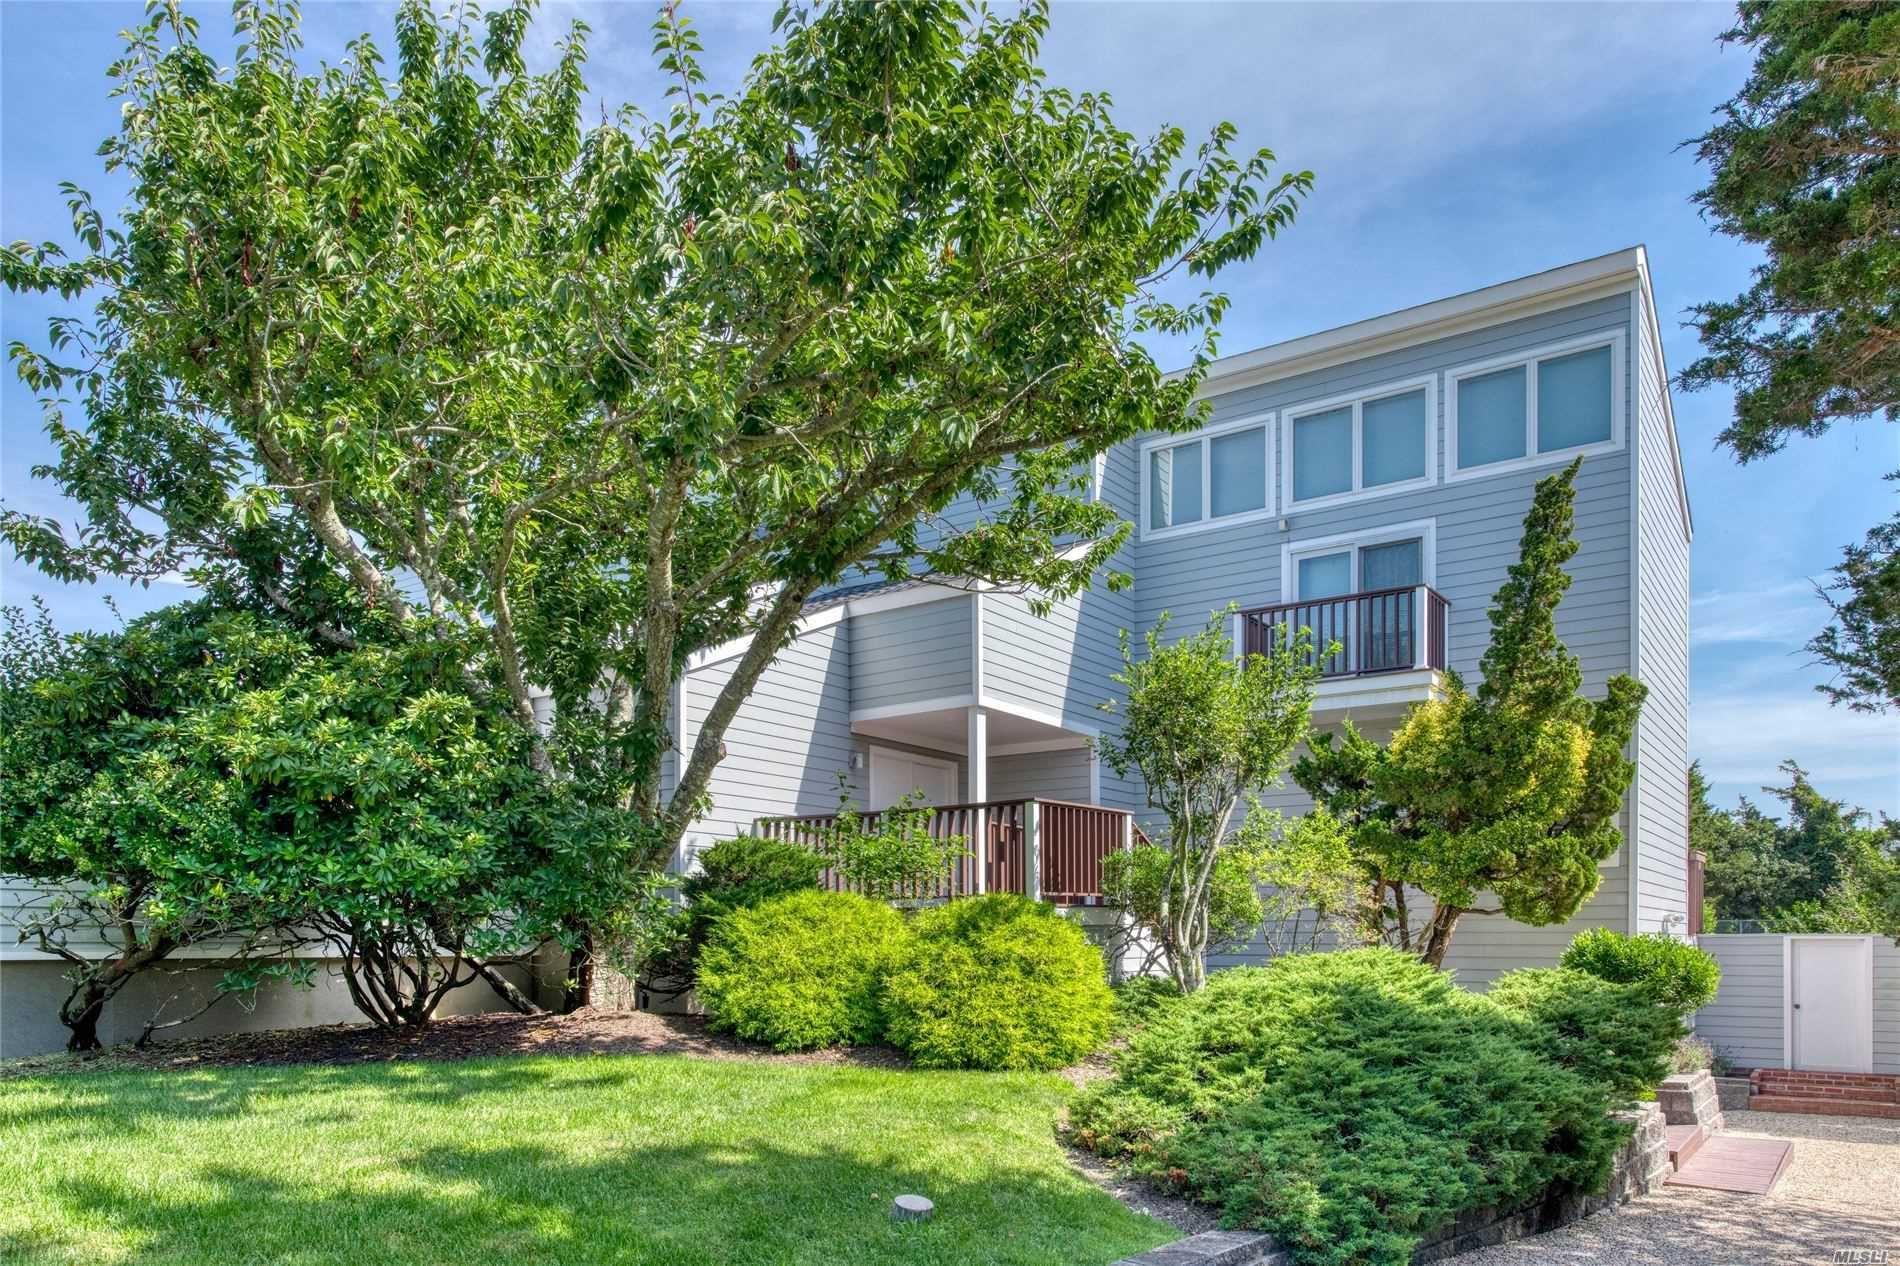 32 Reynolds Drive, Westhampton Beach, NY 11978 - MLS#: 3233752